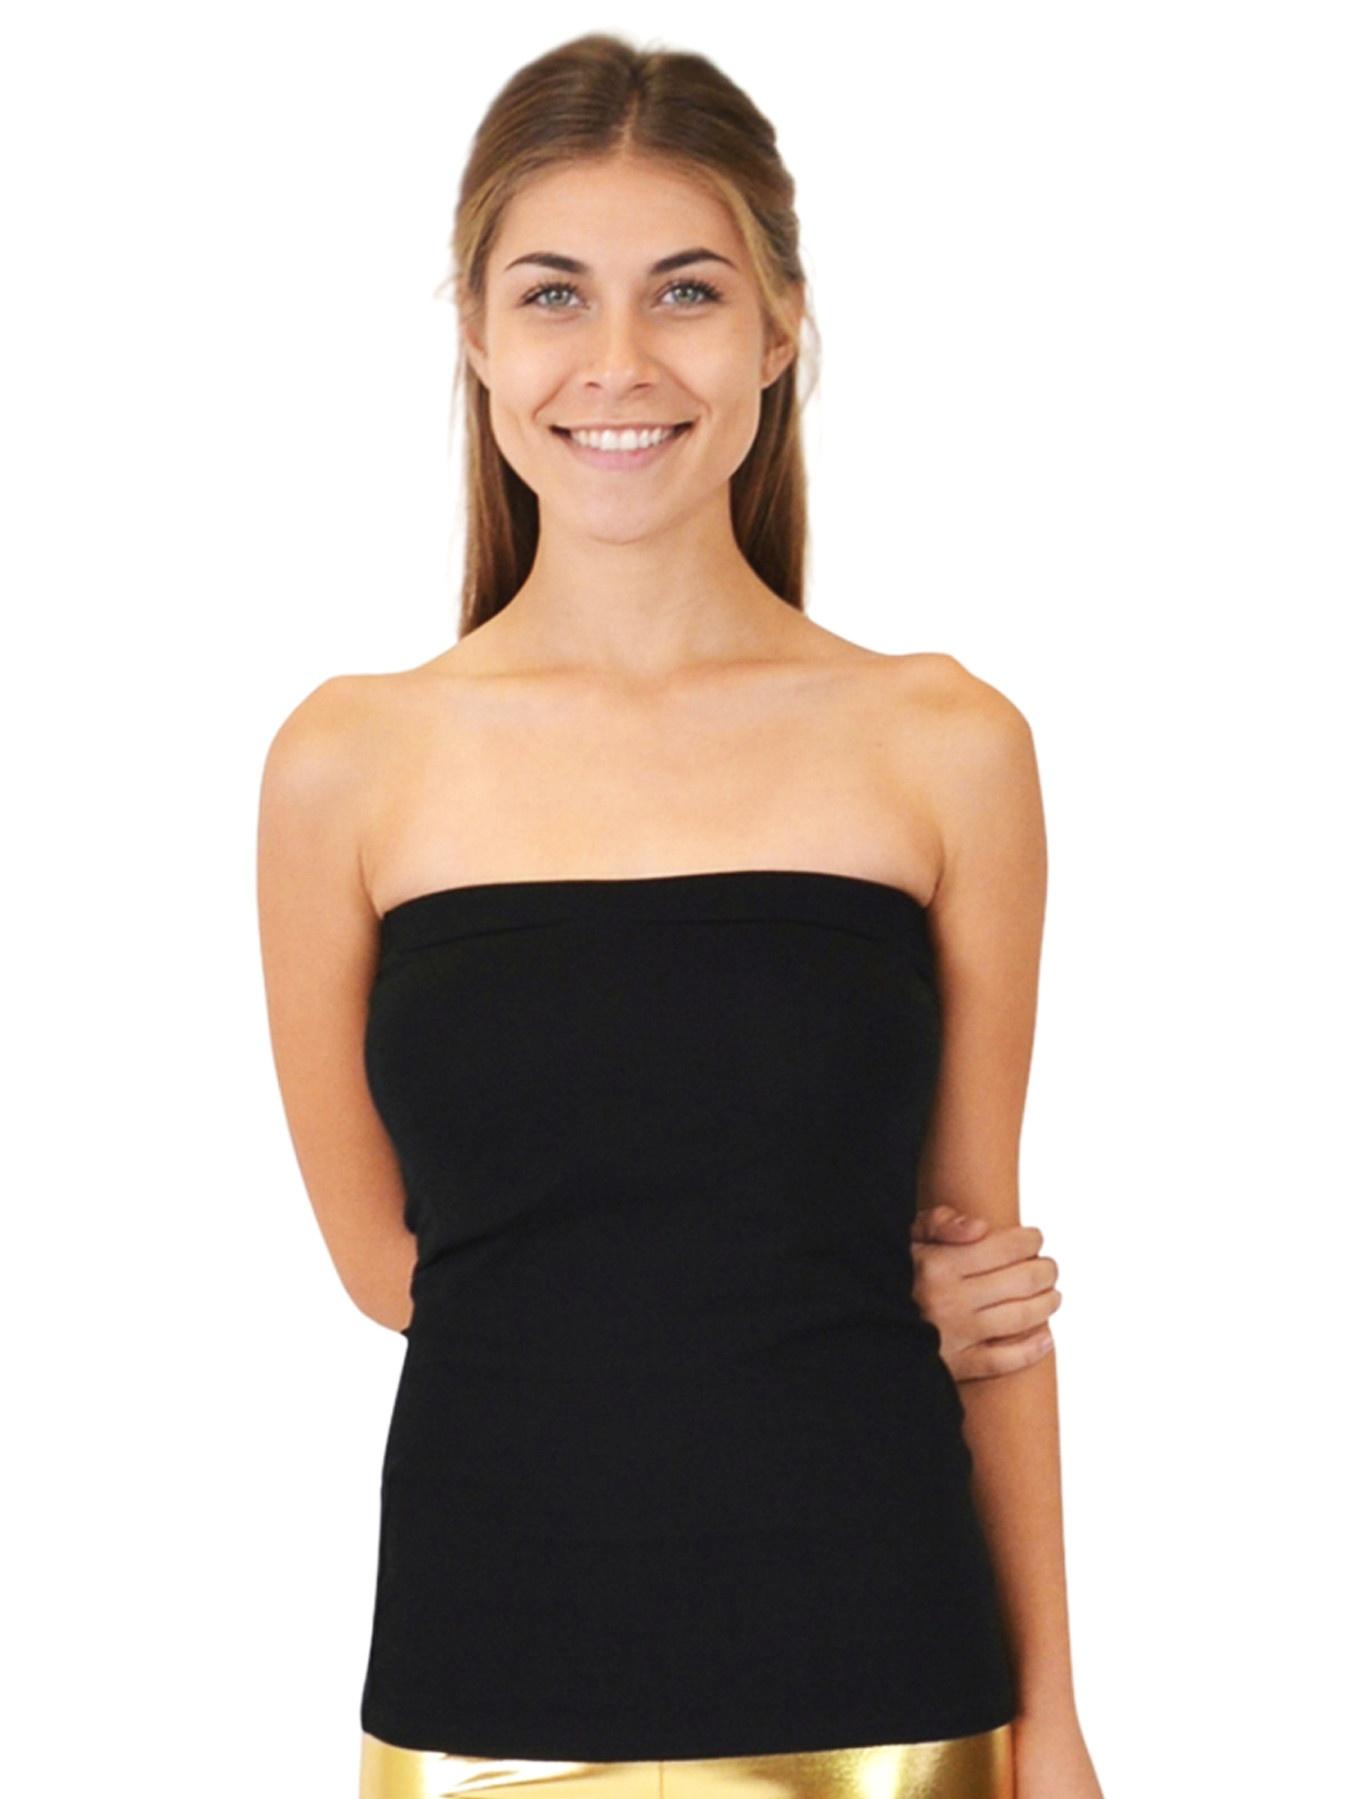 Teamwear Cotton Strapless Tube Top - Small Adult (0-2) / Black